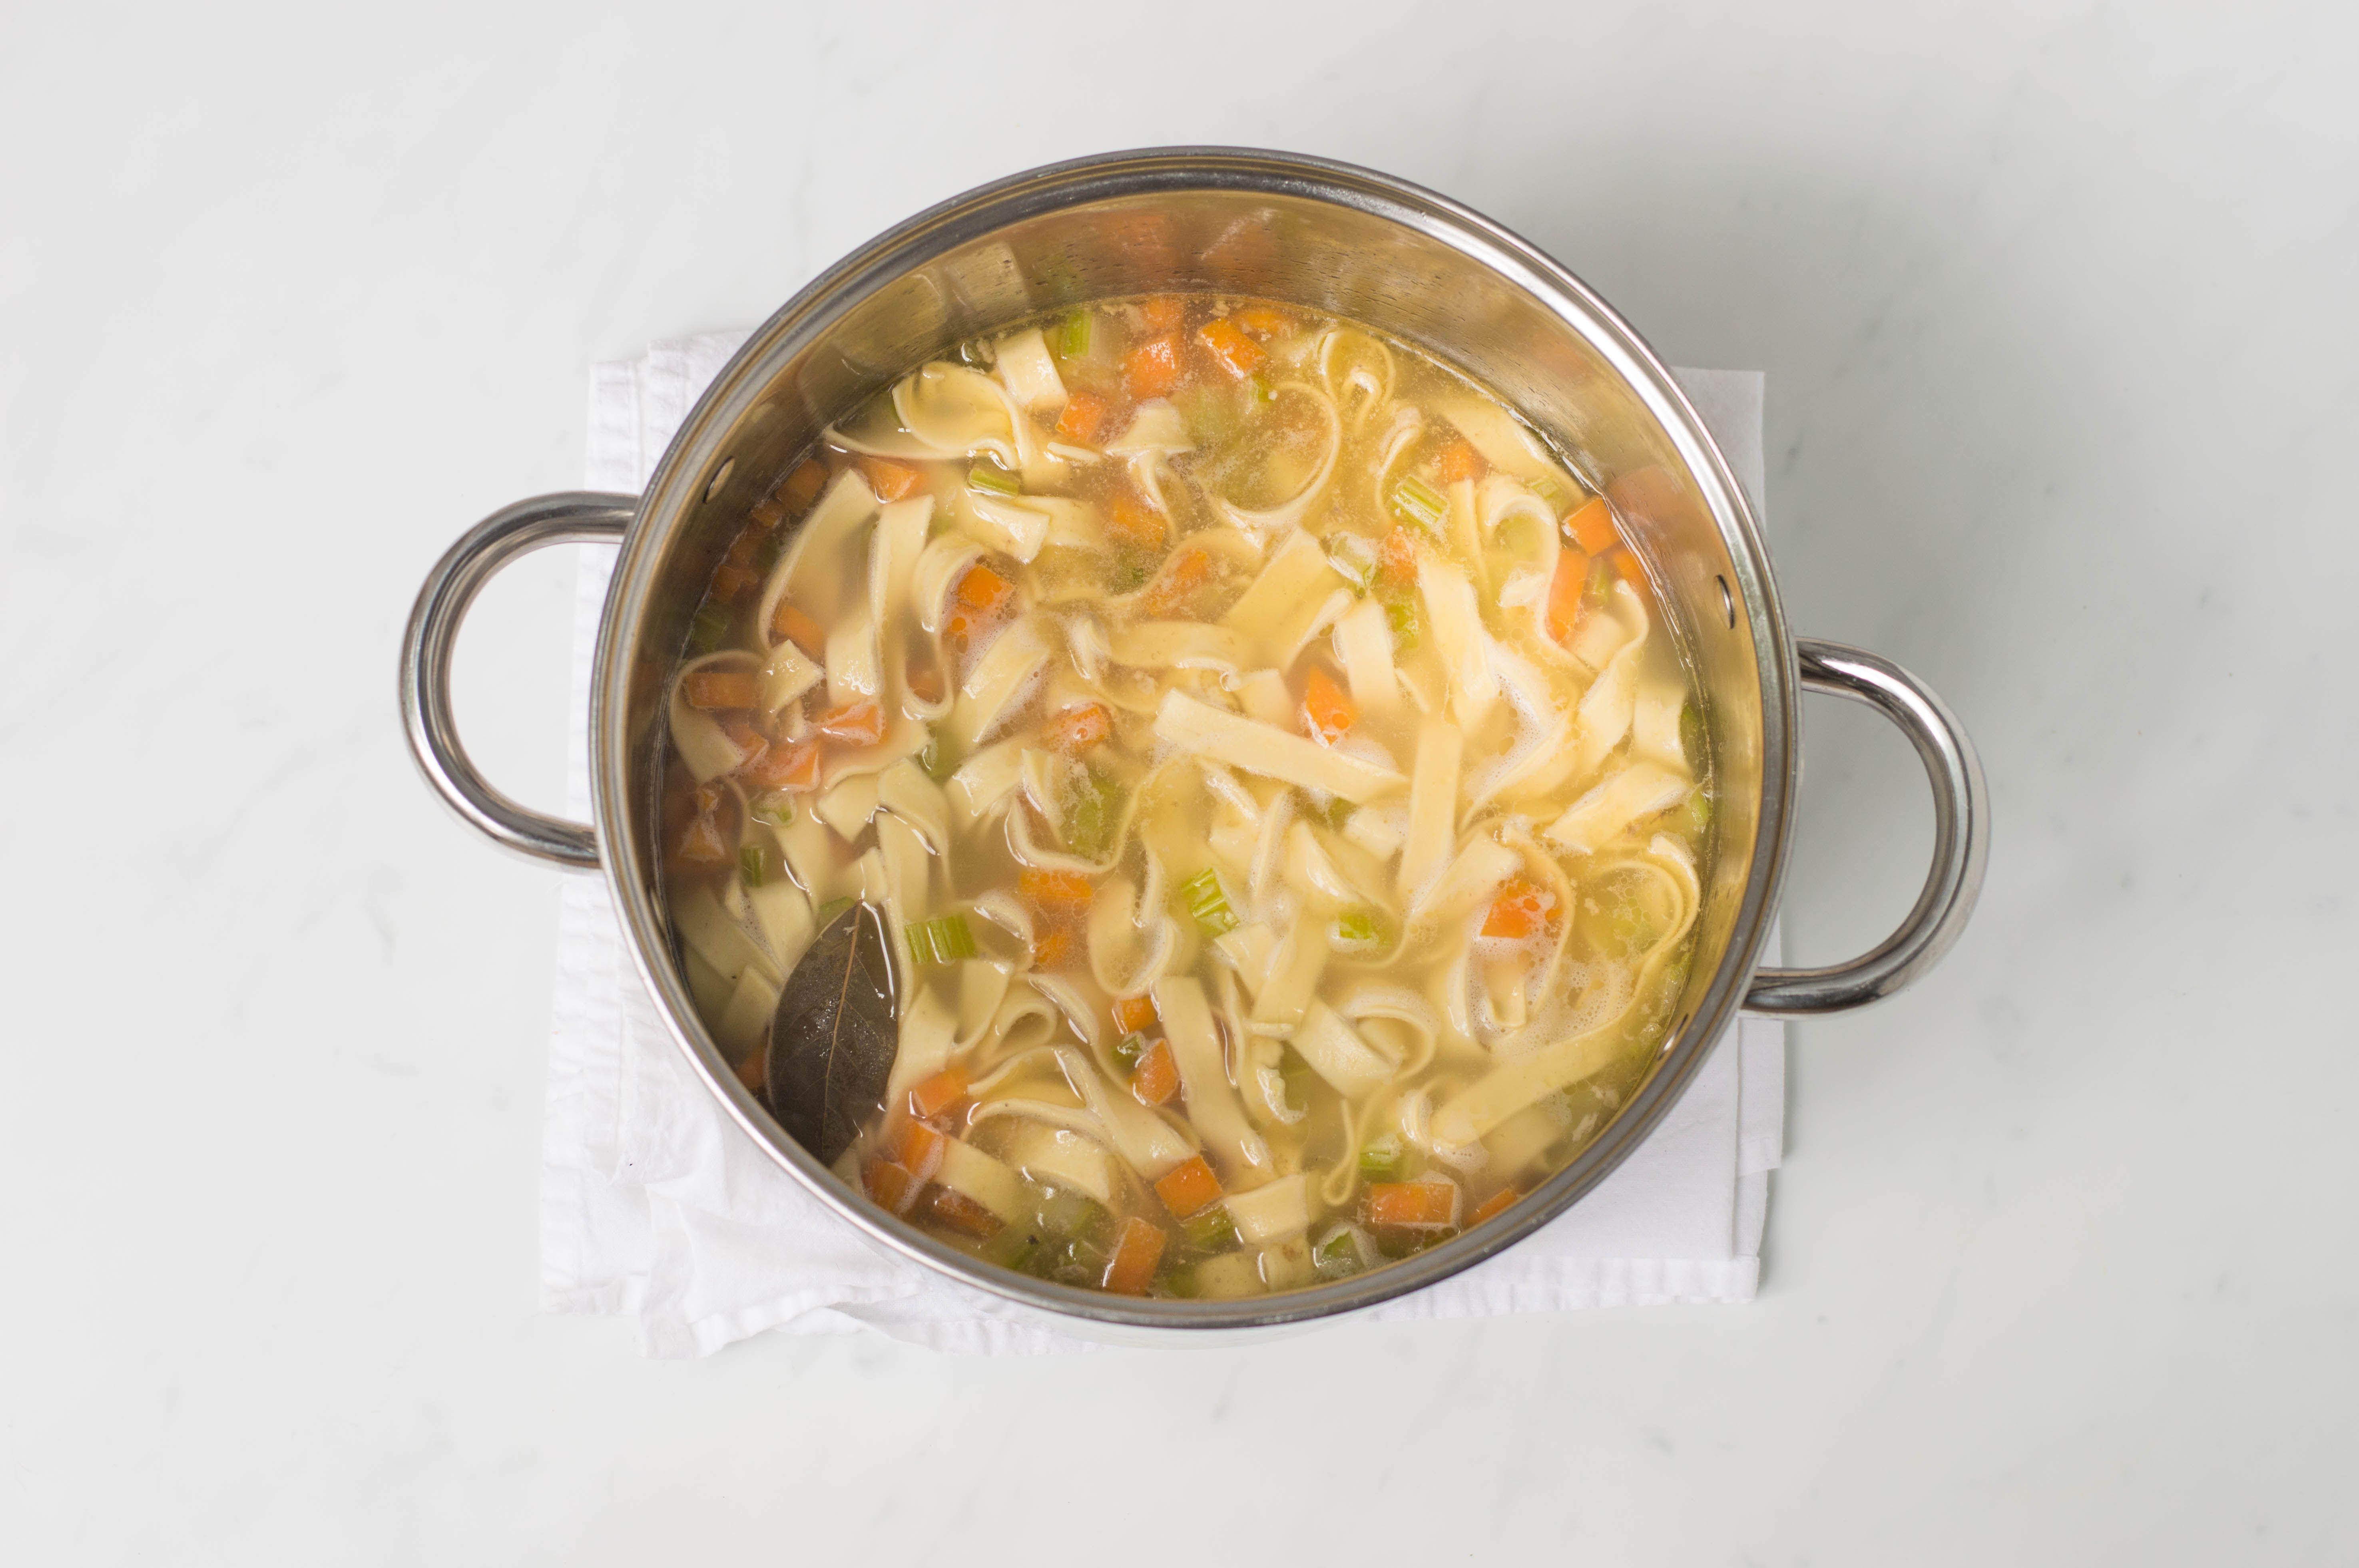 add the noodles, and cook until al dente